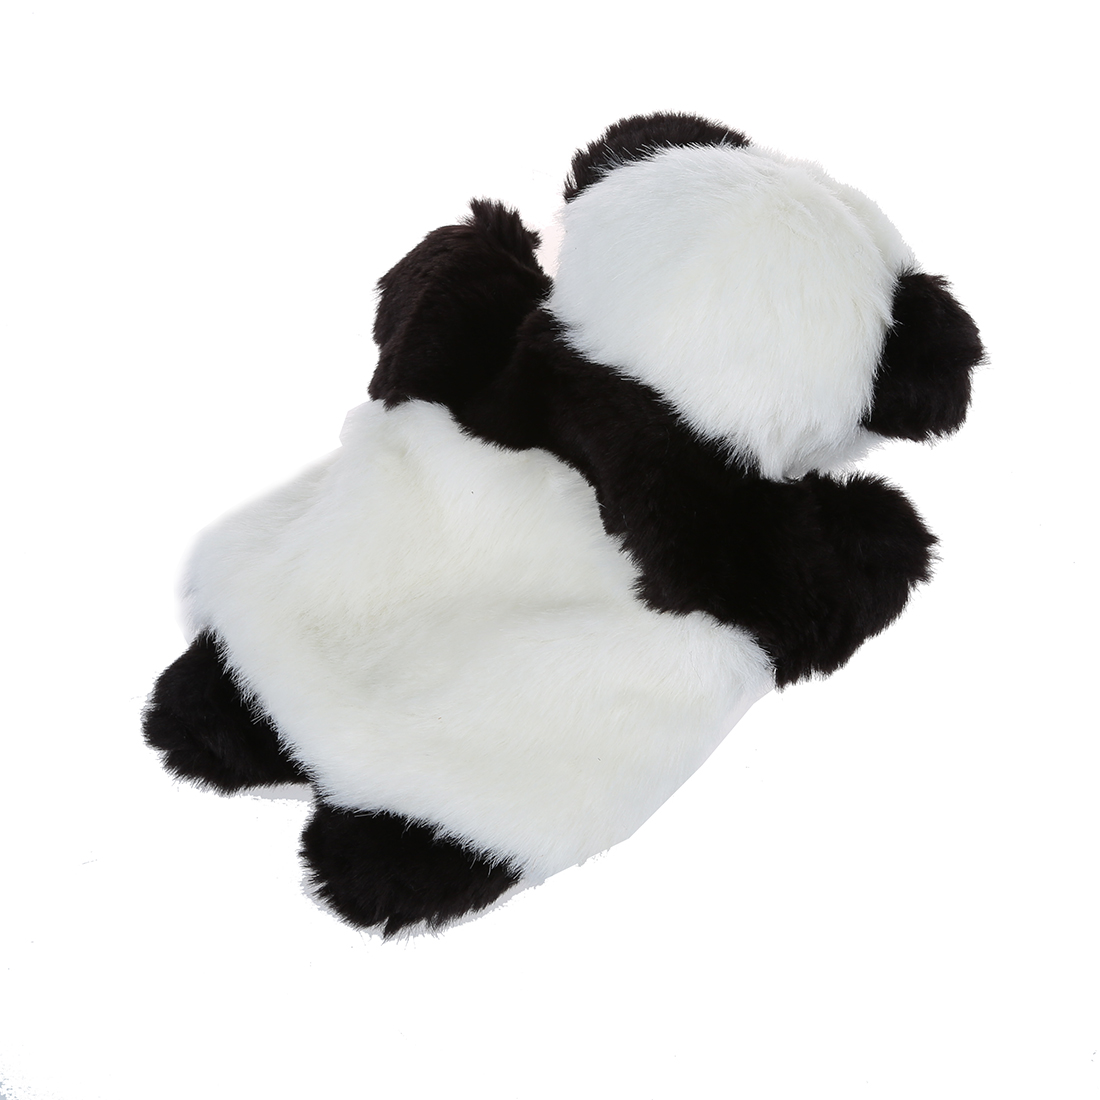 Cute Panda Wildlife Hand Glove Puppet Soft Plush Puppets Kid Childrens Toy Gift